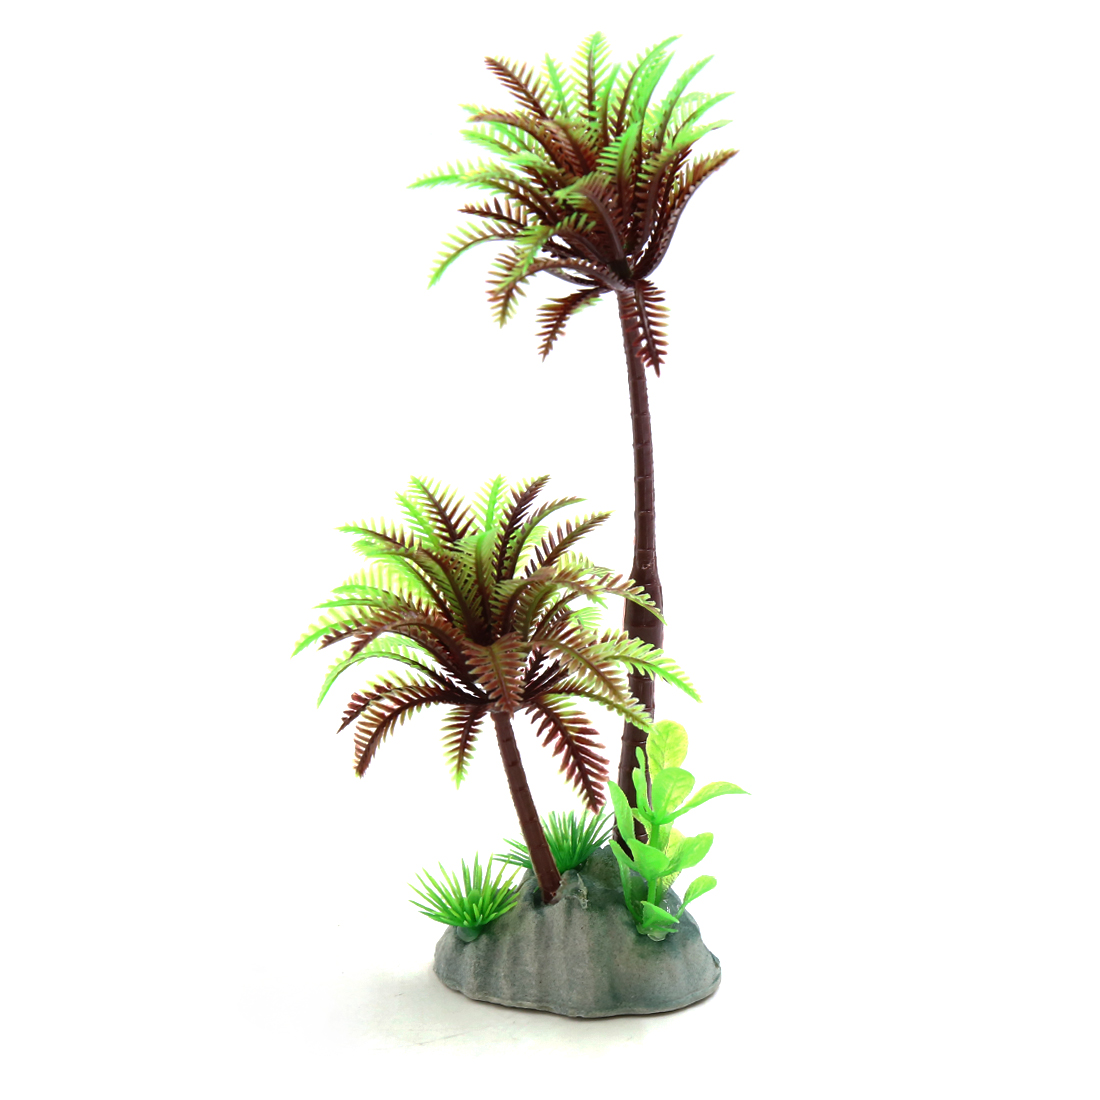 Plastic Coconut Trees Terrarium Tank Decorations for Reptiles Amphibians Lizards